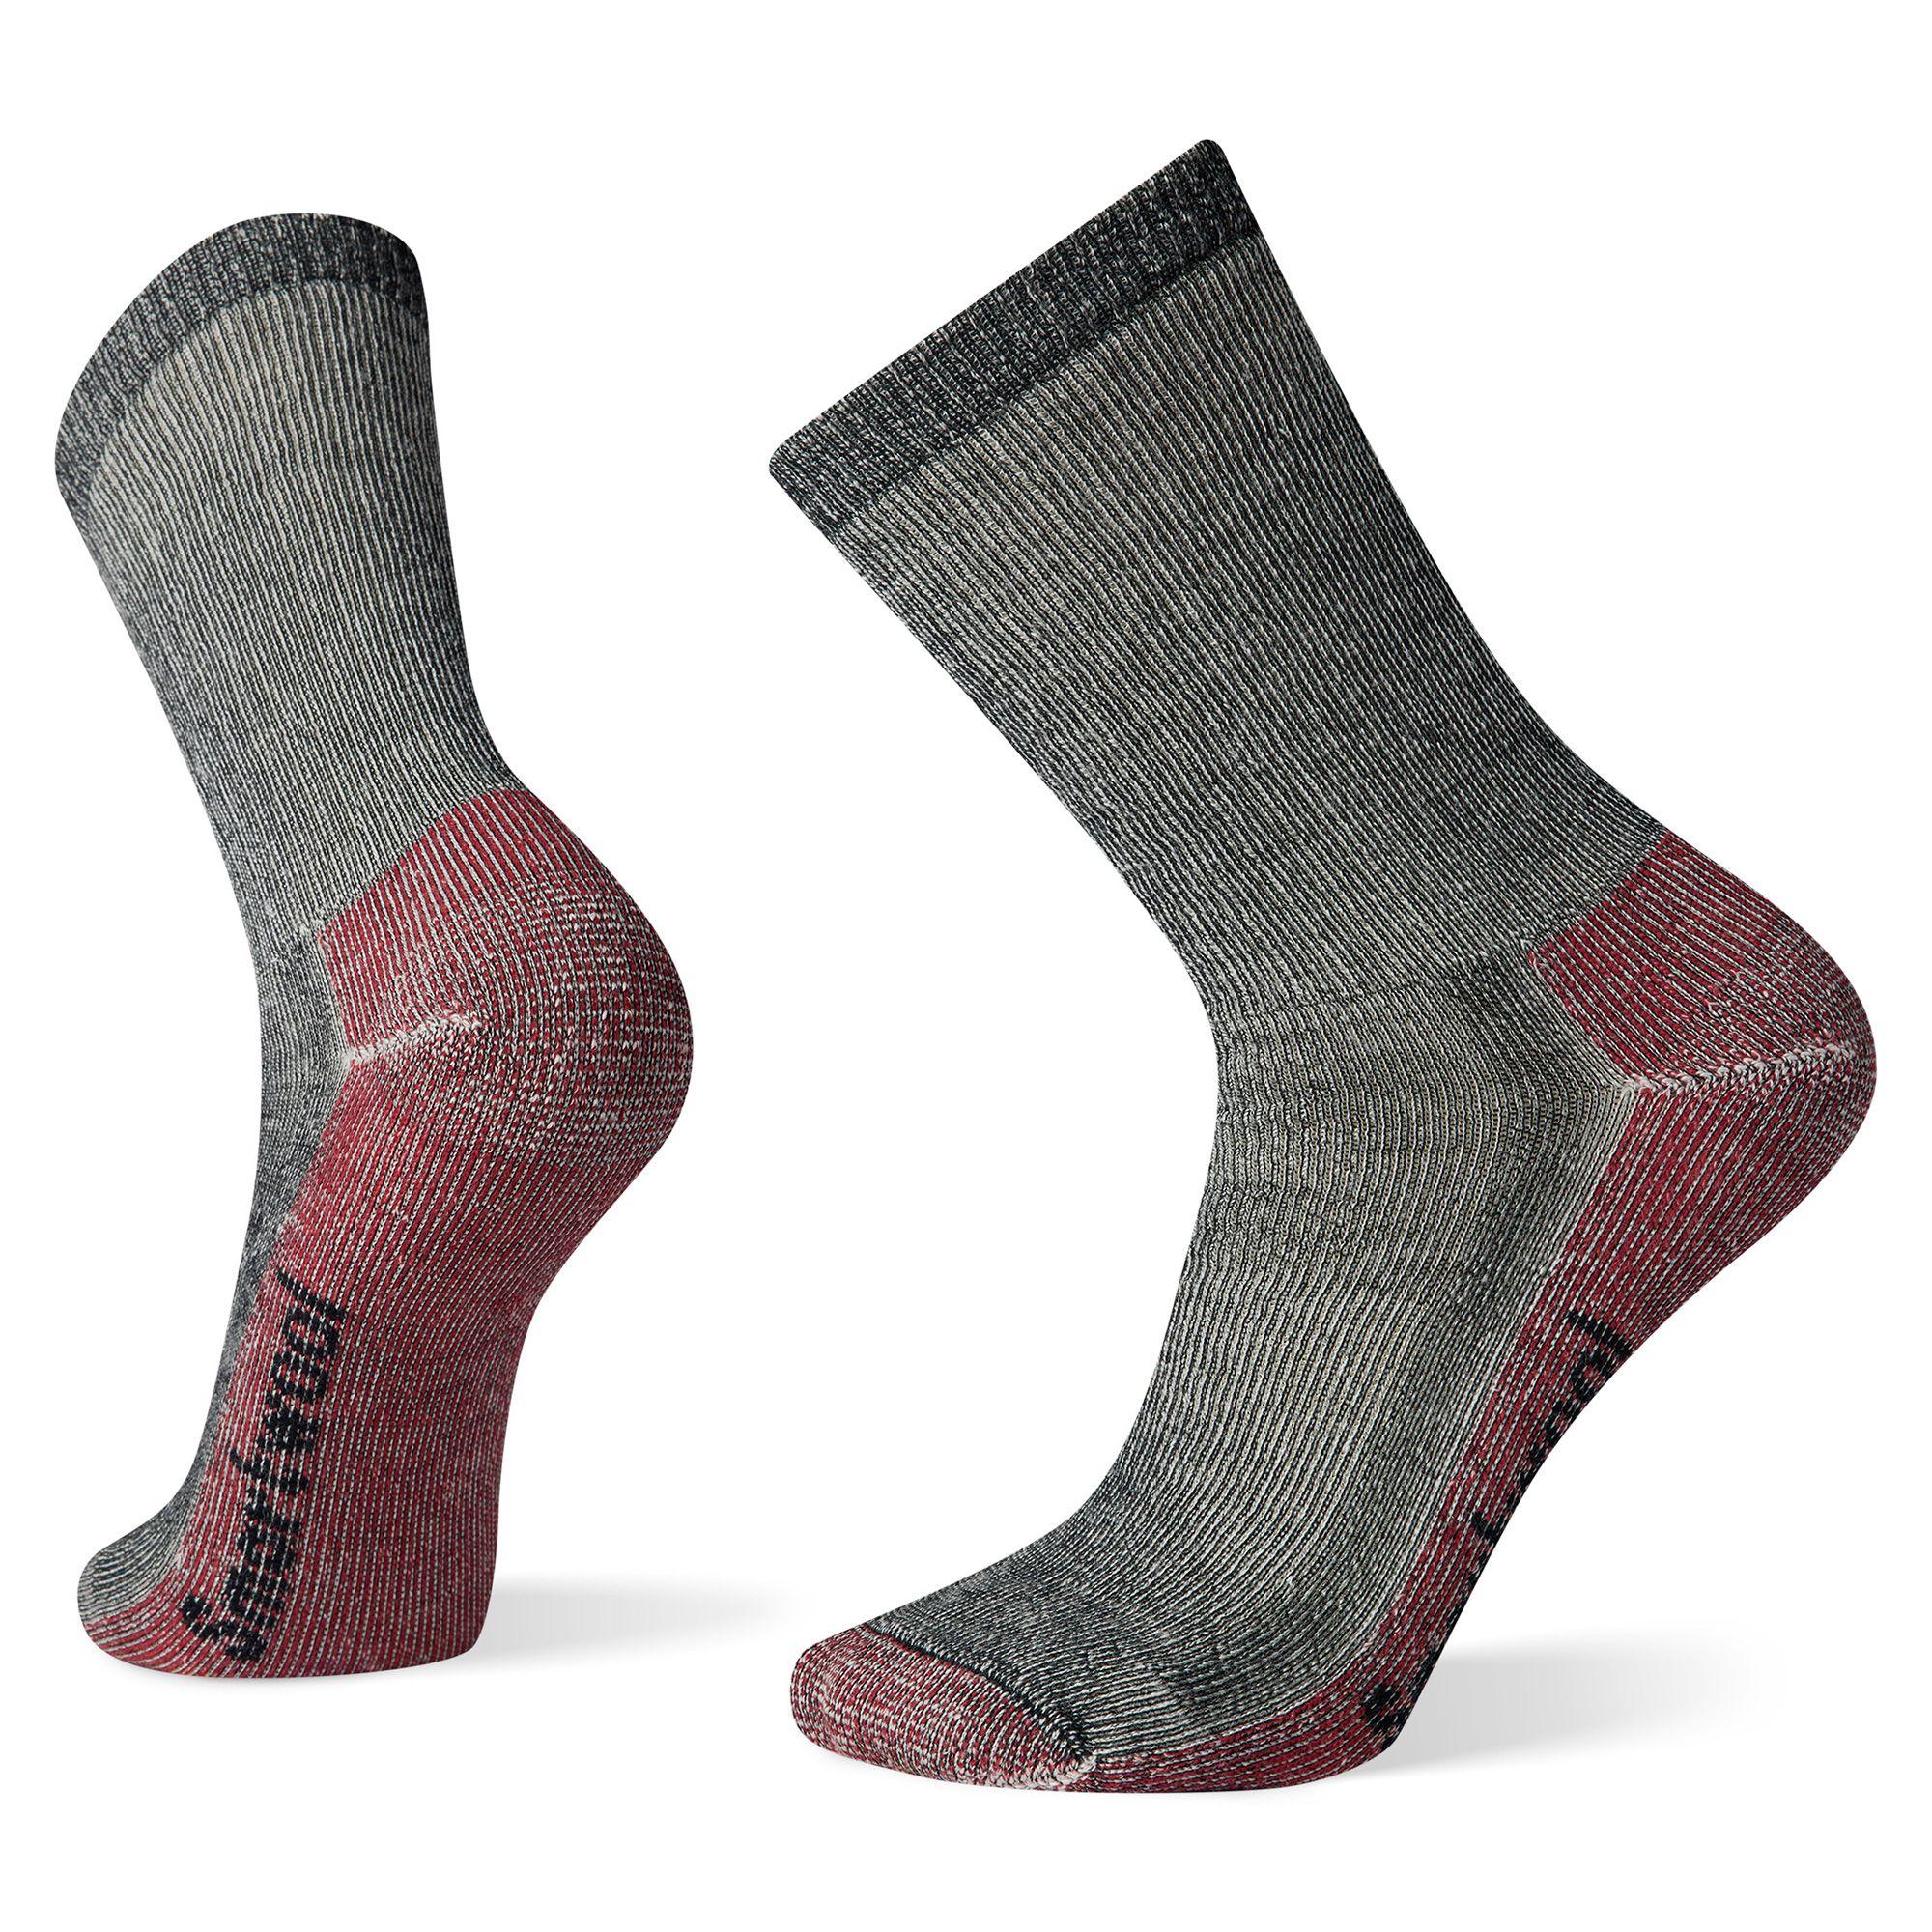 Men's Hike Classic Edition Full Cushion Crew Socks